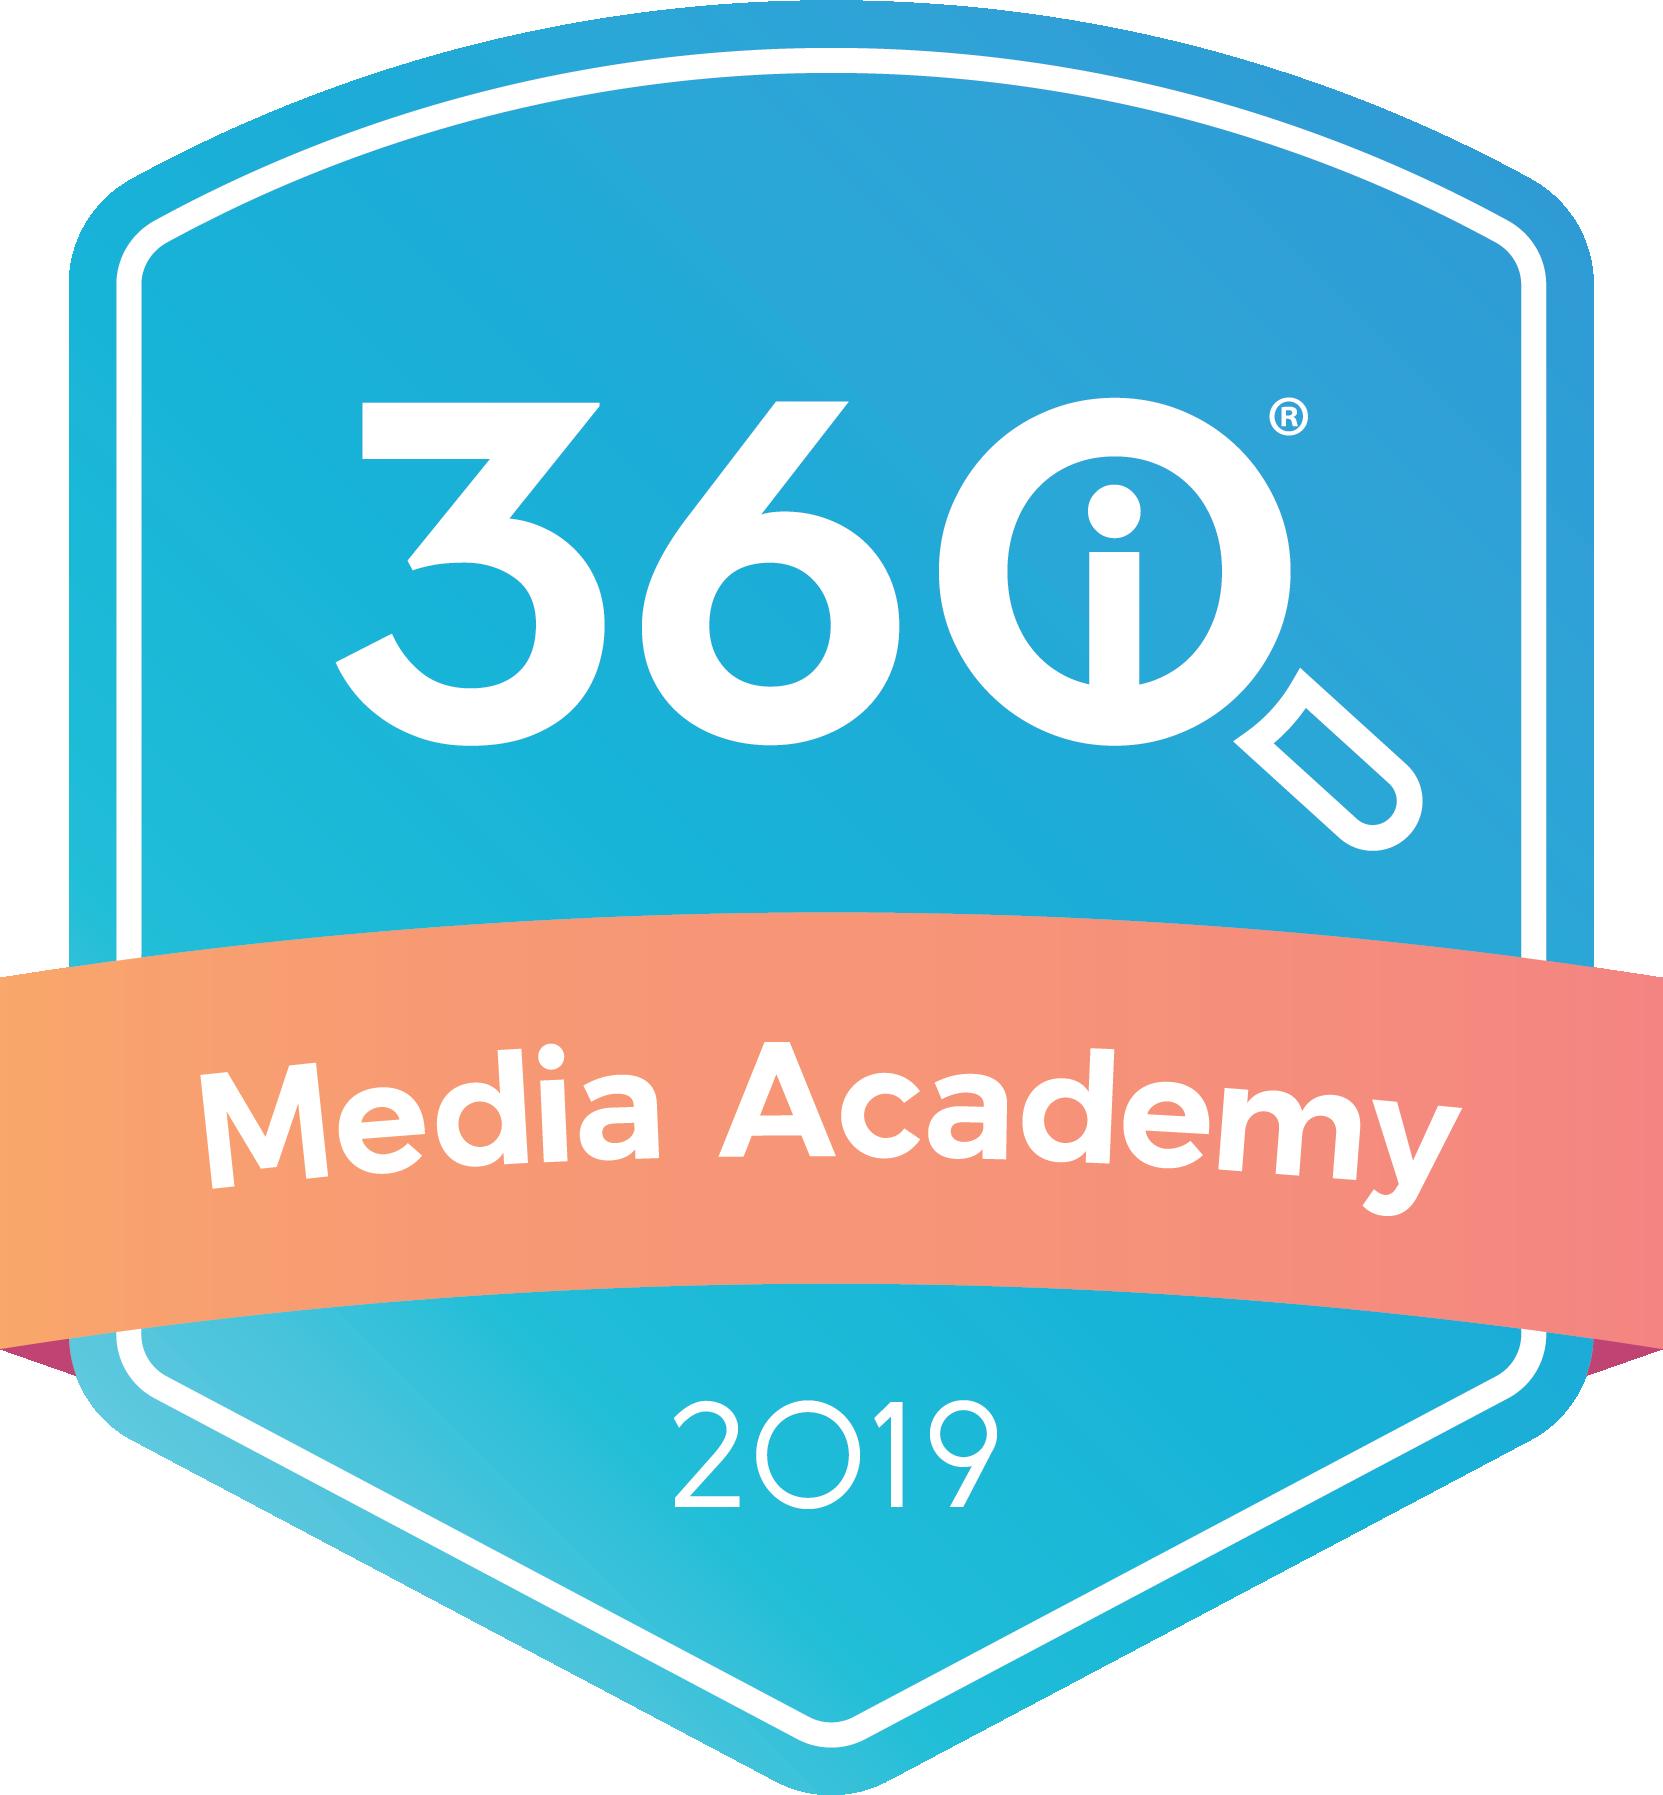 360i_MediaAcademy_Logo_Final2019.png